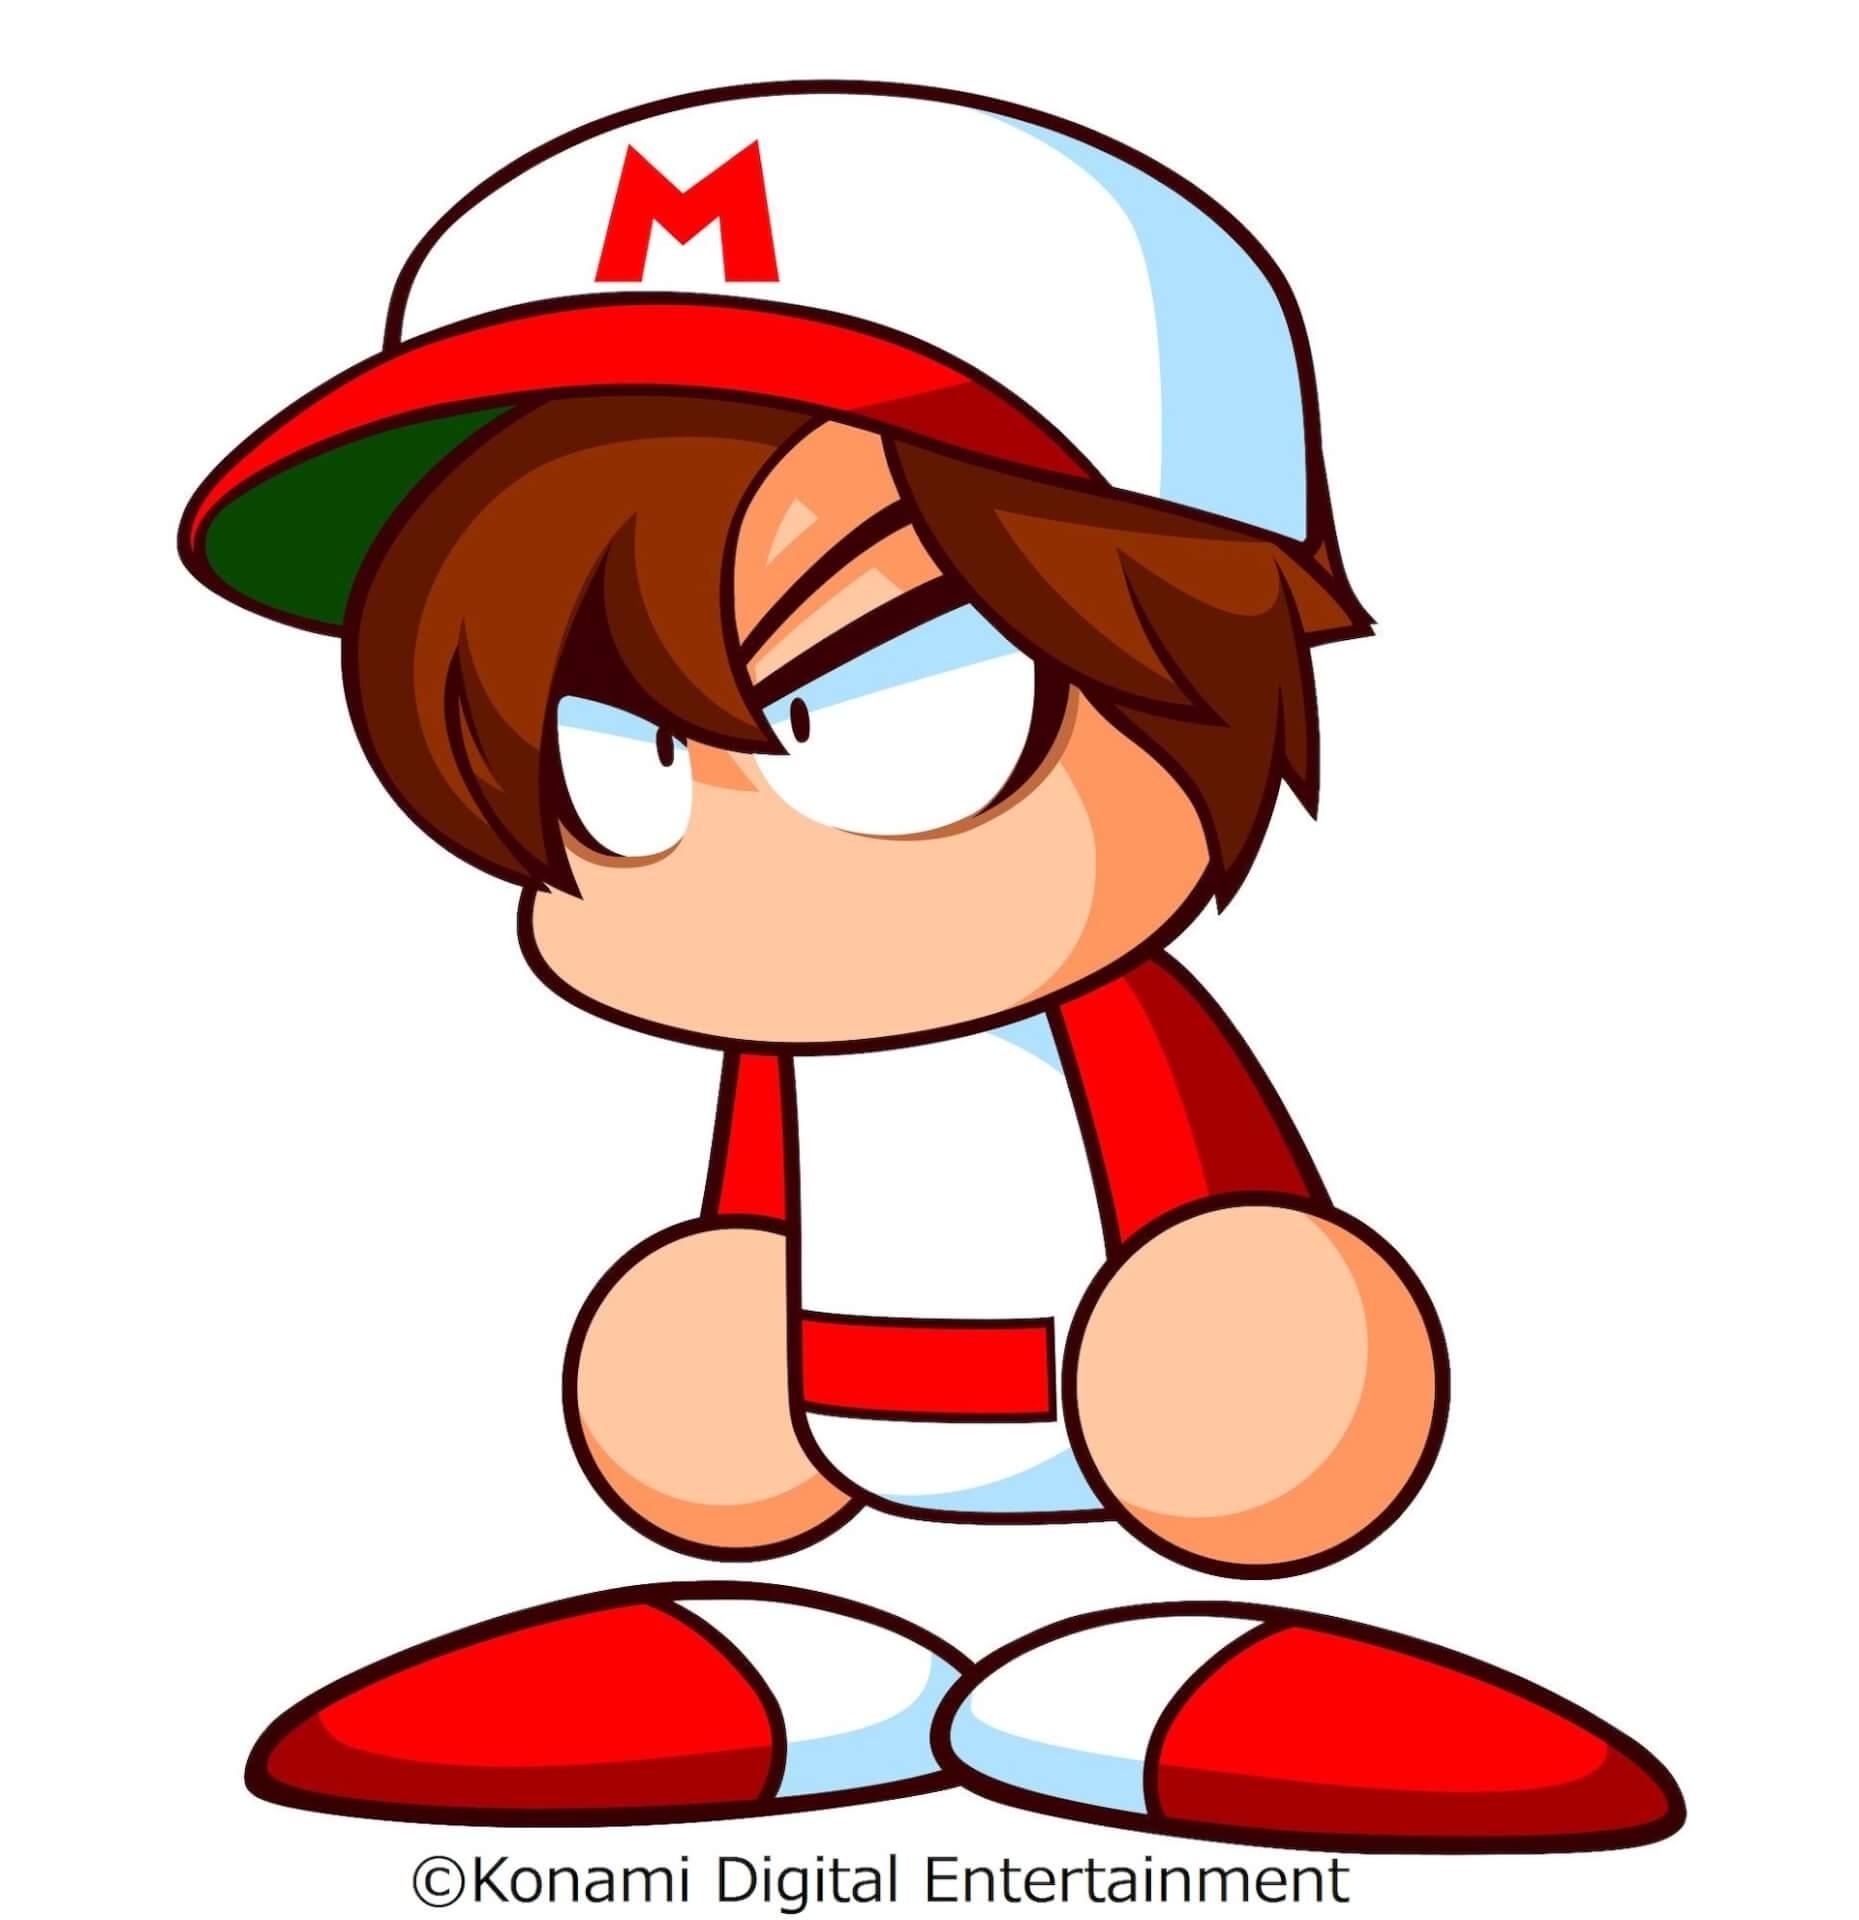 Nintendo Switch『パワプロクンポケットR』の発売日が11月25日に決定!DLCパワポケダッシュも早期購入特典に tech210805_pawapoker_8